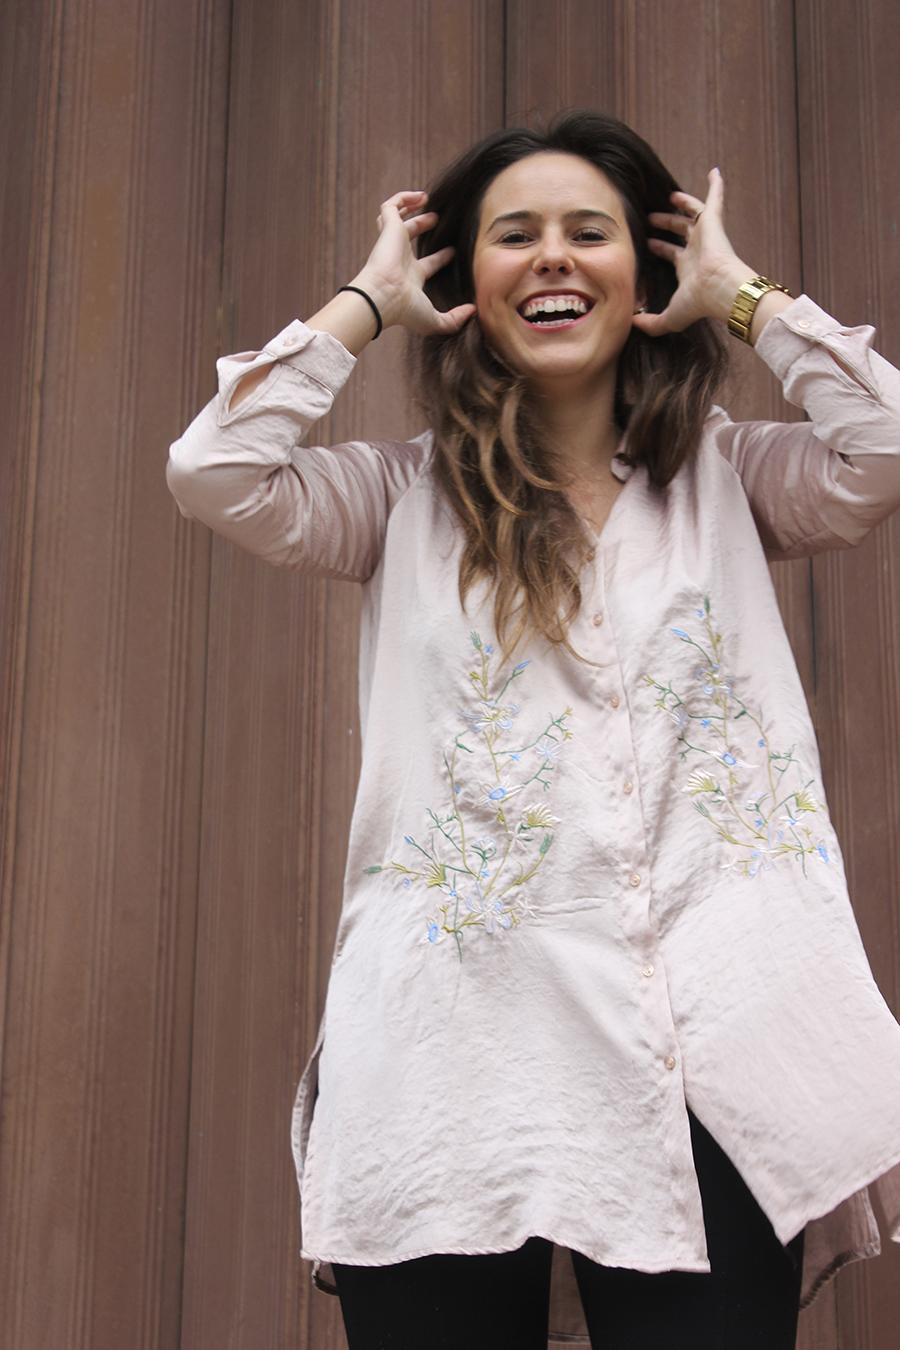 Embroidery Satin Primark shirt